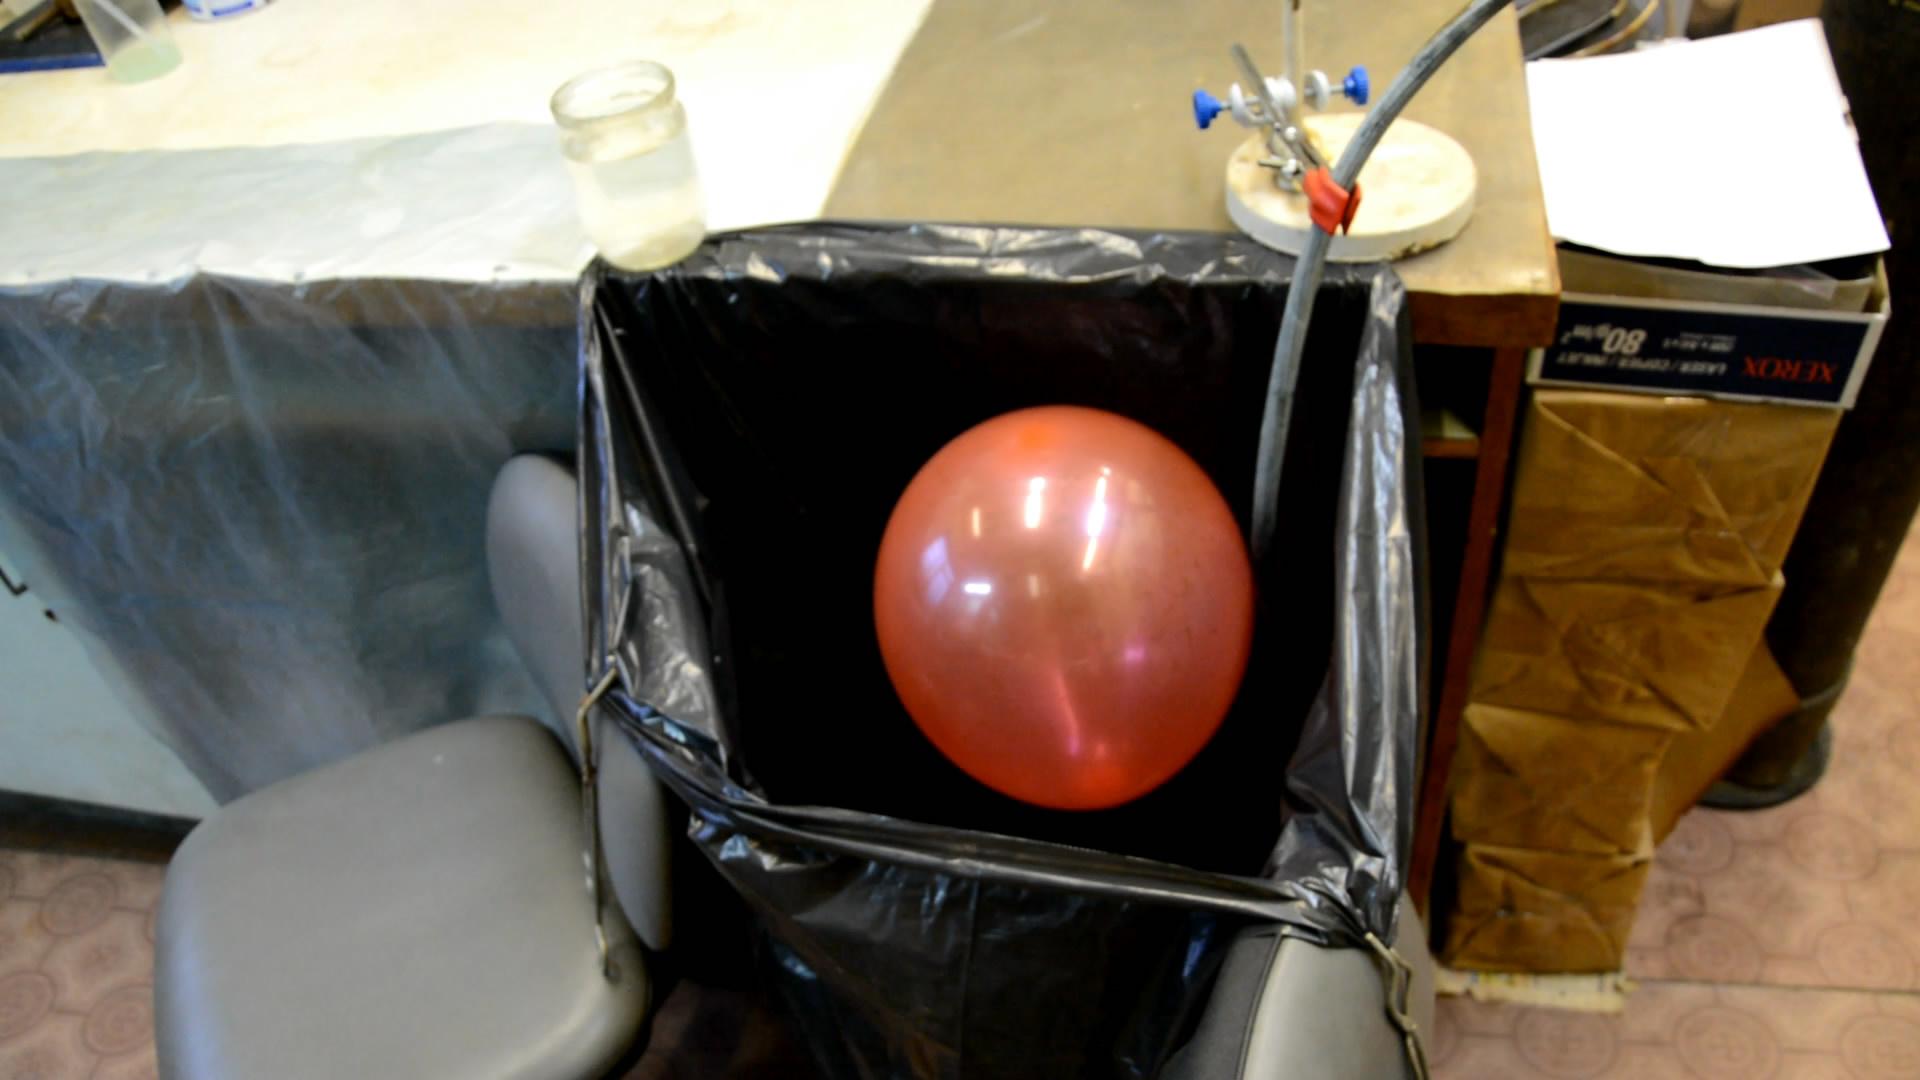 Левитация воздушного шарика в углекислом газе